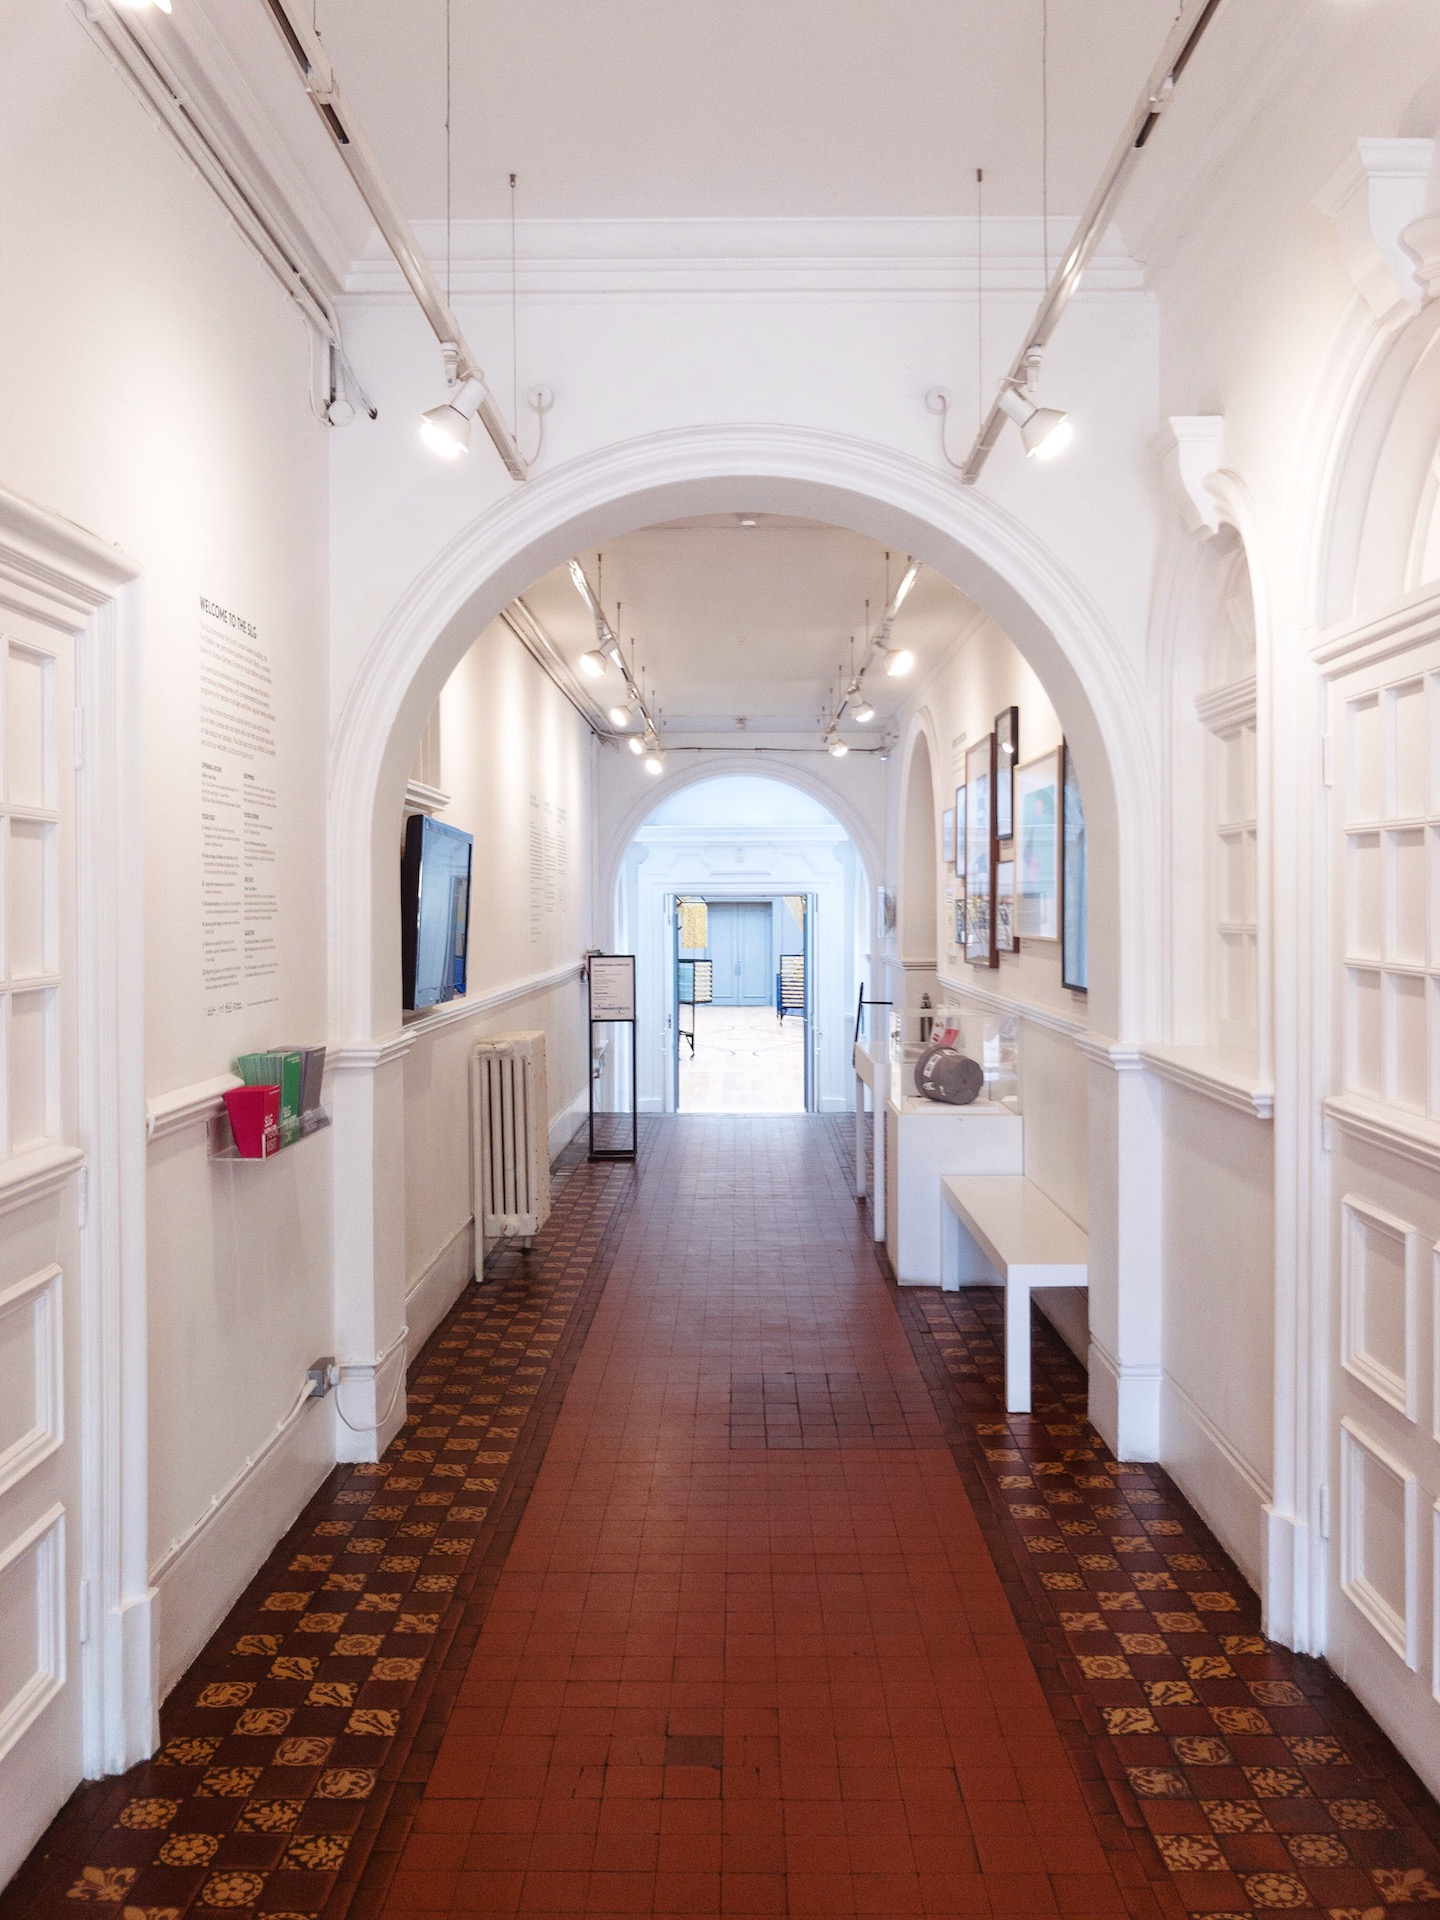 South London Gallery Corridor - What Dominika Did.JPG